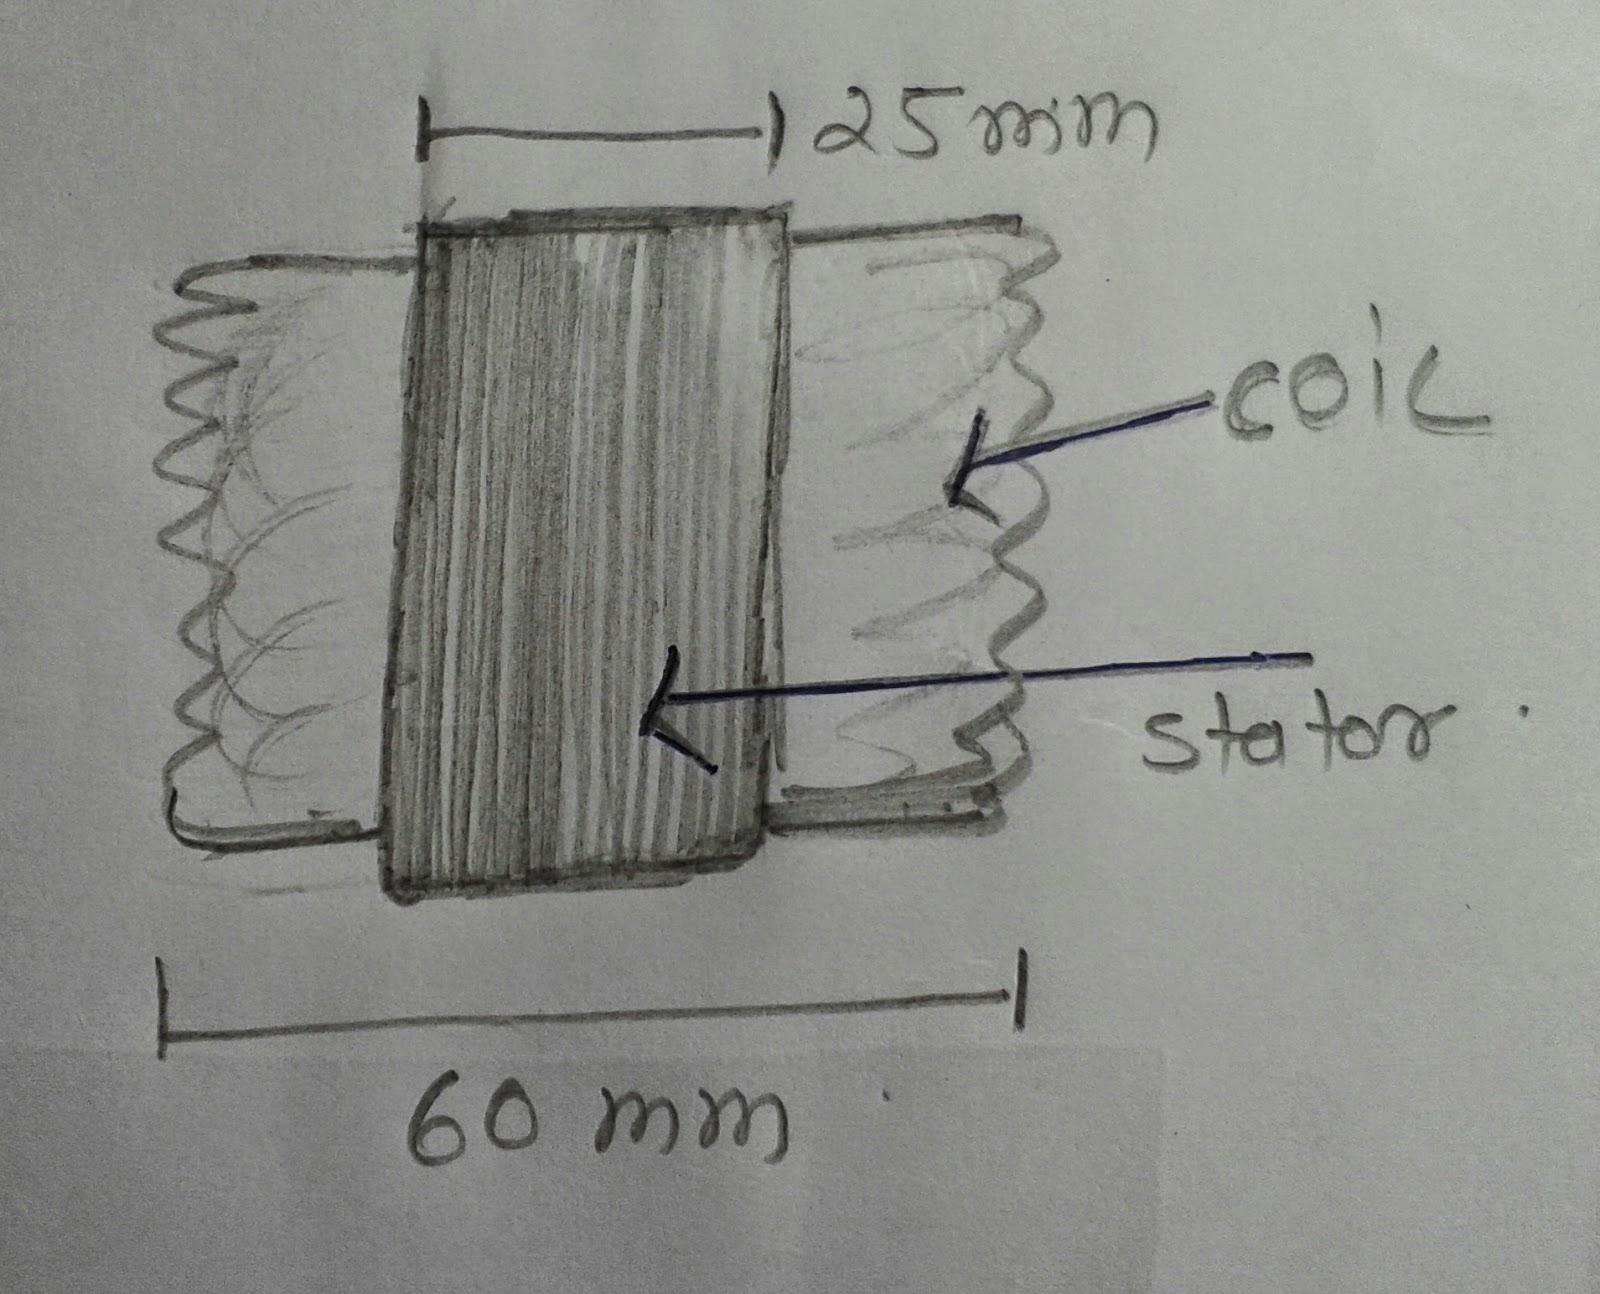 hight resolution of orient wall fan winding data